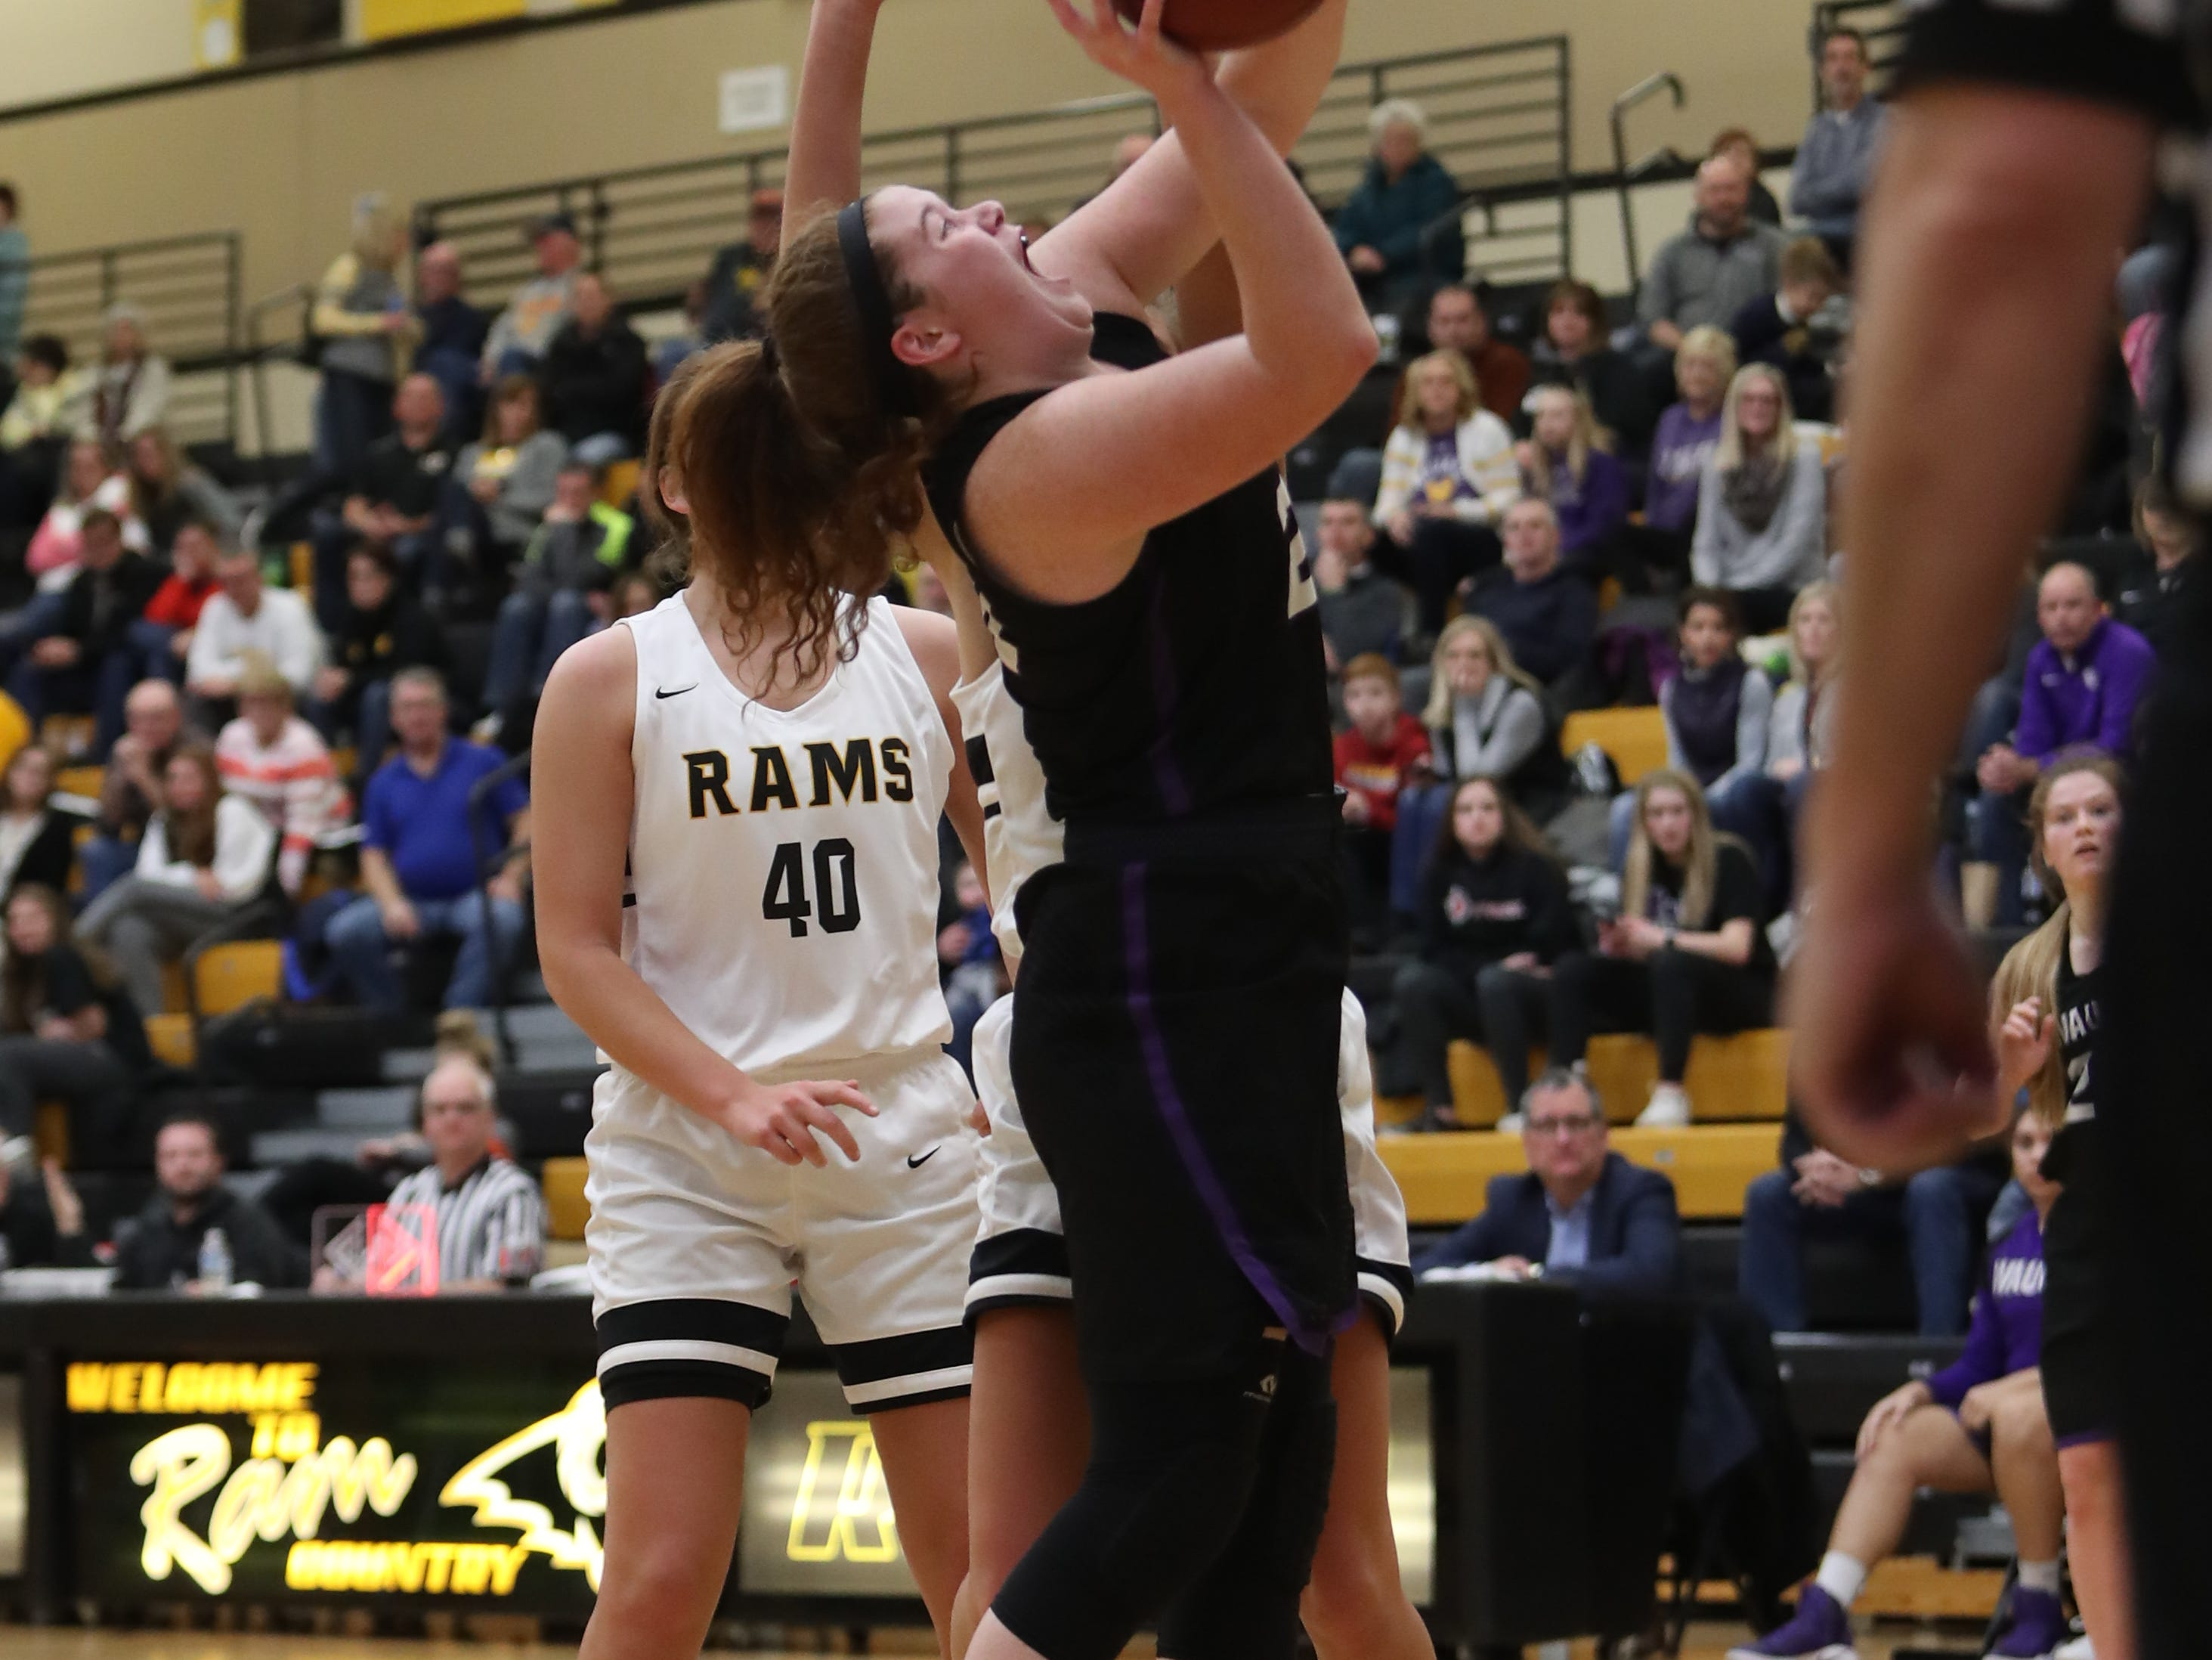 Waukee Warriors' Anna Brown (20) scores against the Southeast Polk Rams during a game Feb. 1, 2019 at Southeast Polk High School.